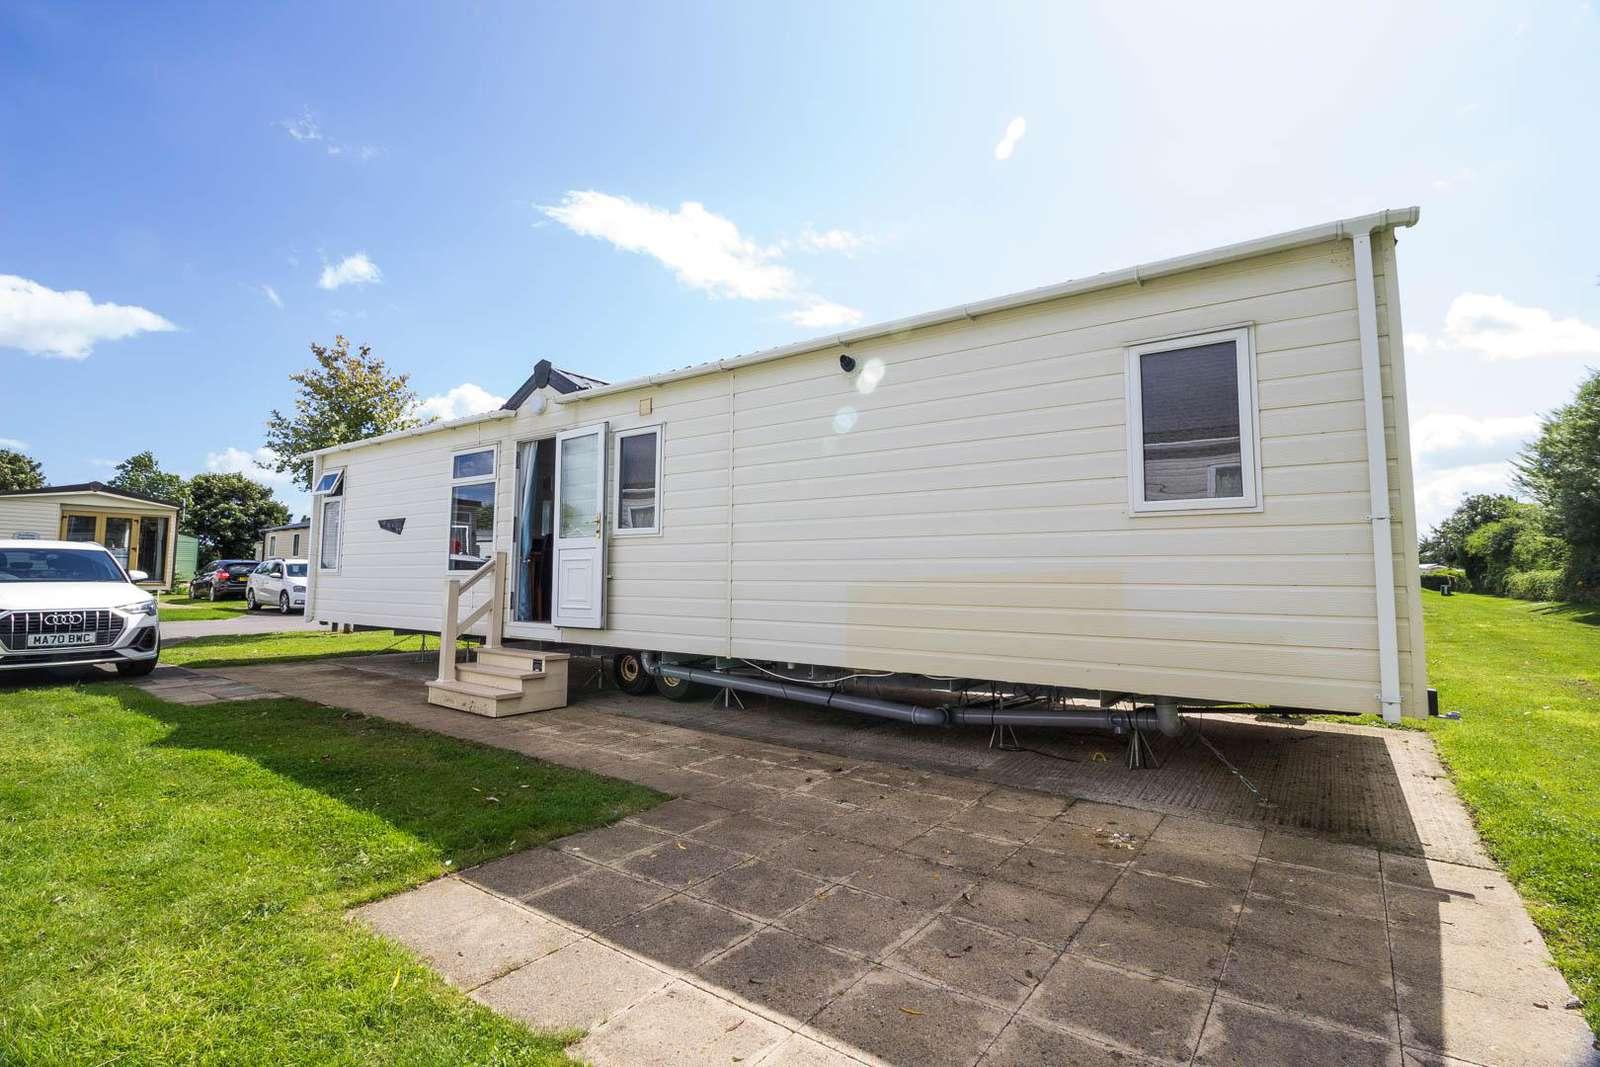 41009B – Bempton Meadow area, 2 bed, 6 berth caravan with D/G & C/H. Diamond rated. - property